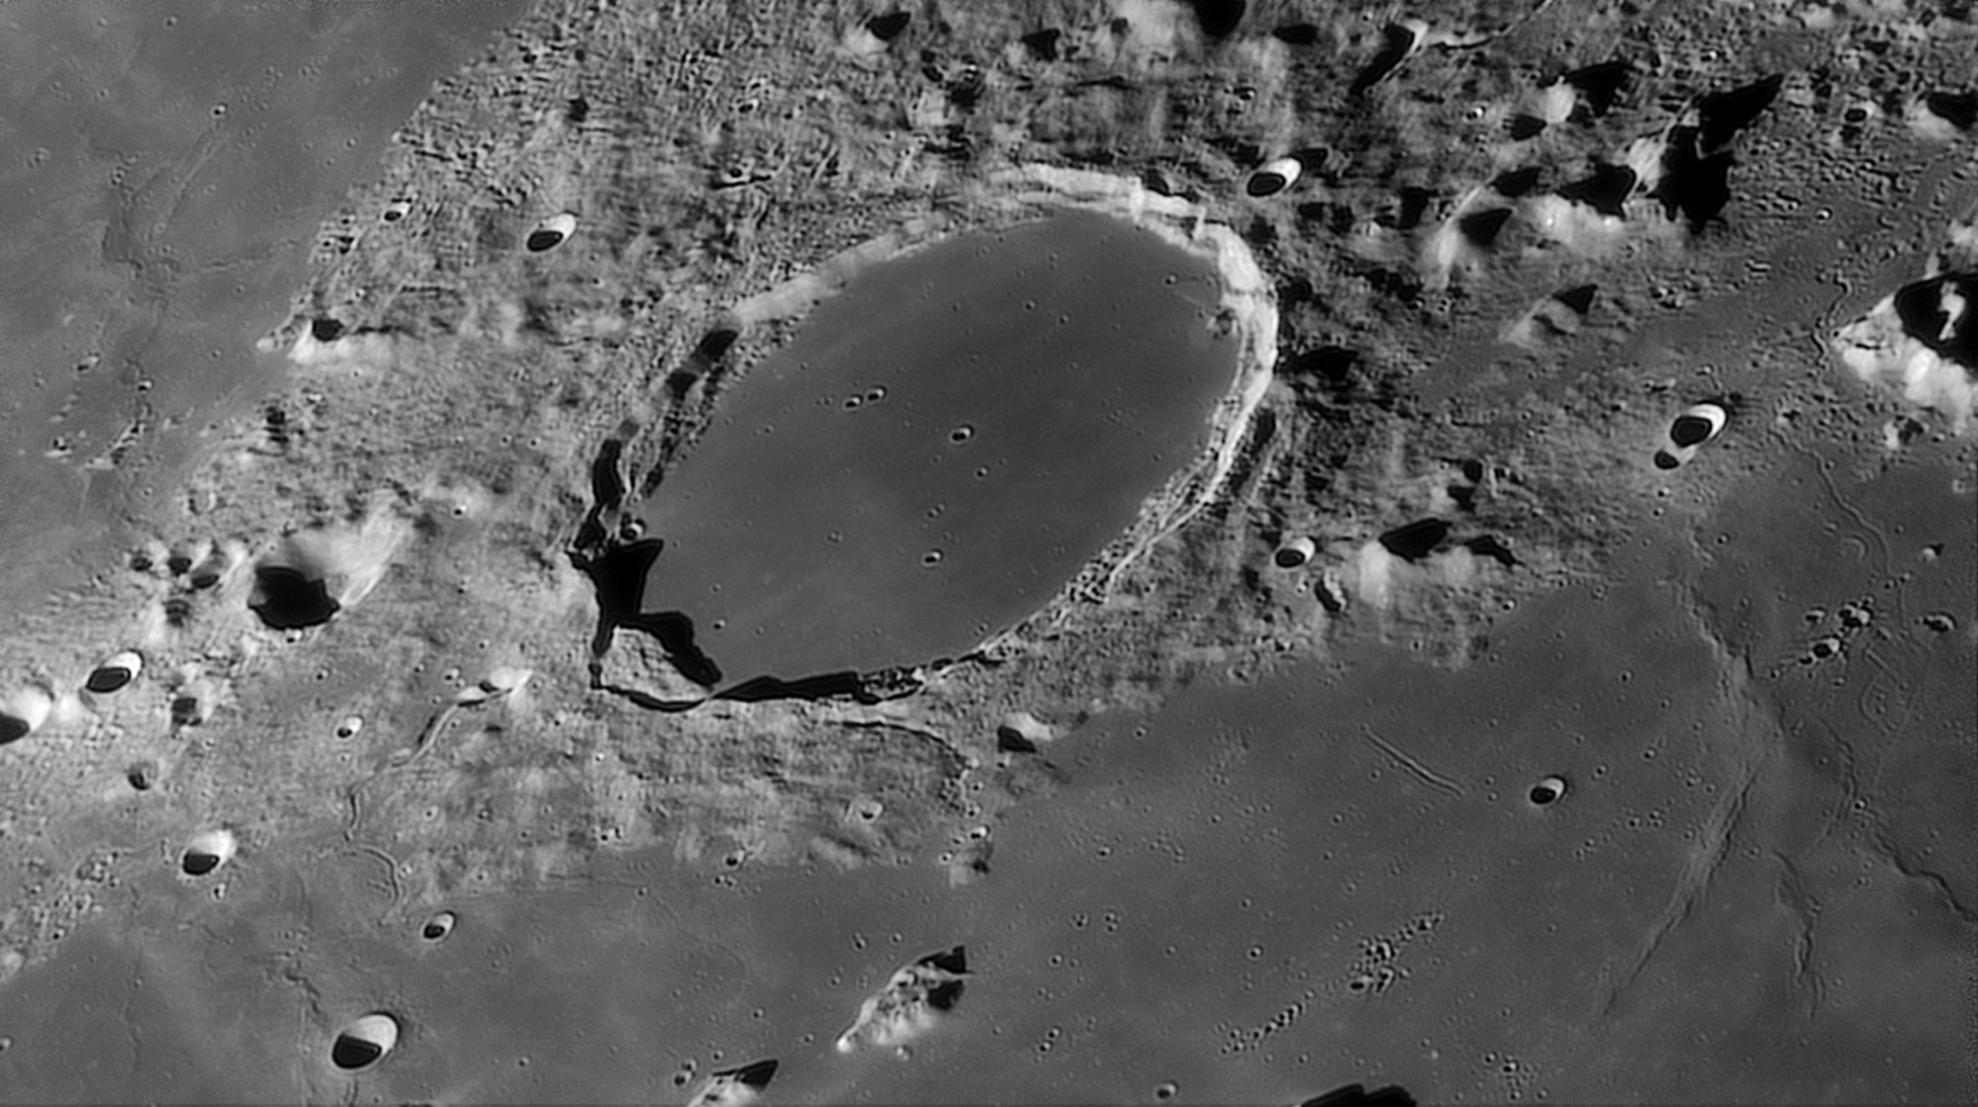 Moon_07_11_2020_03_45_46_R_.jpg.4d73bc8f4e734fb9ee33084ae508cca6.jpg